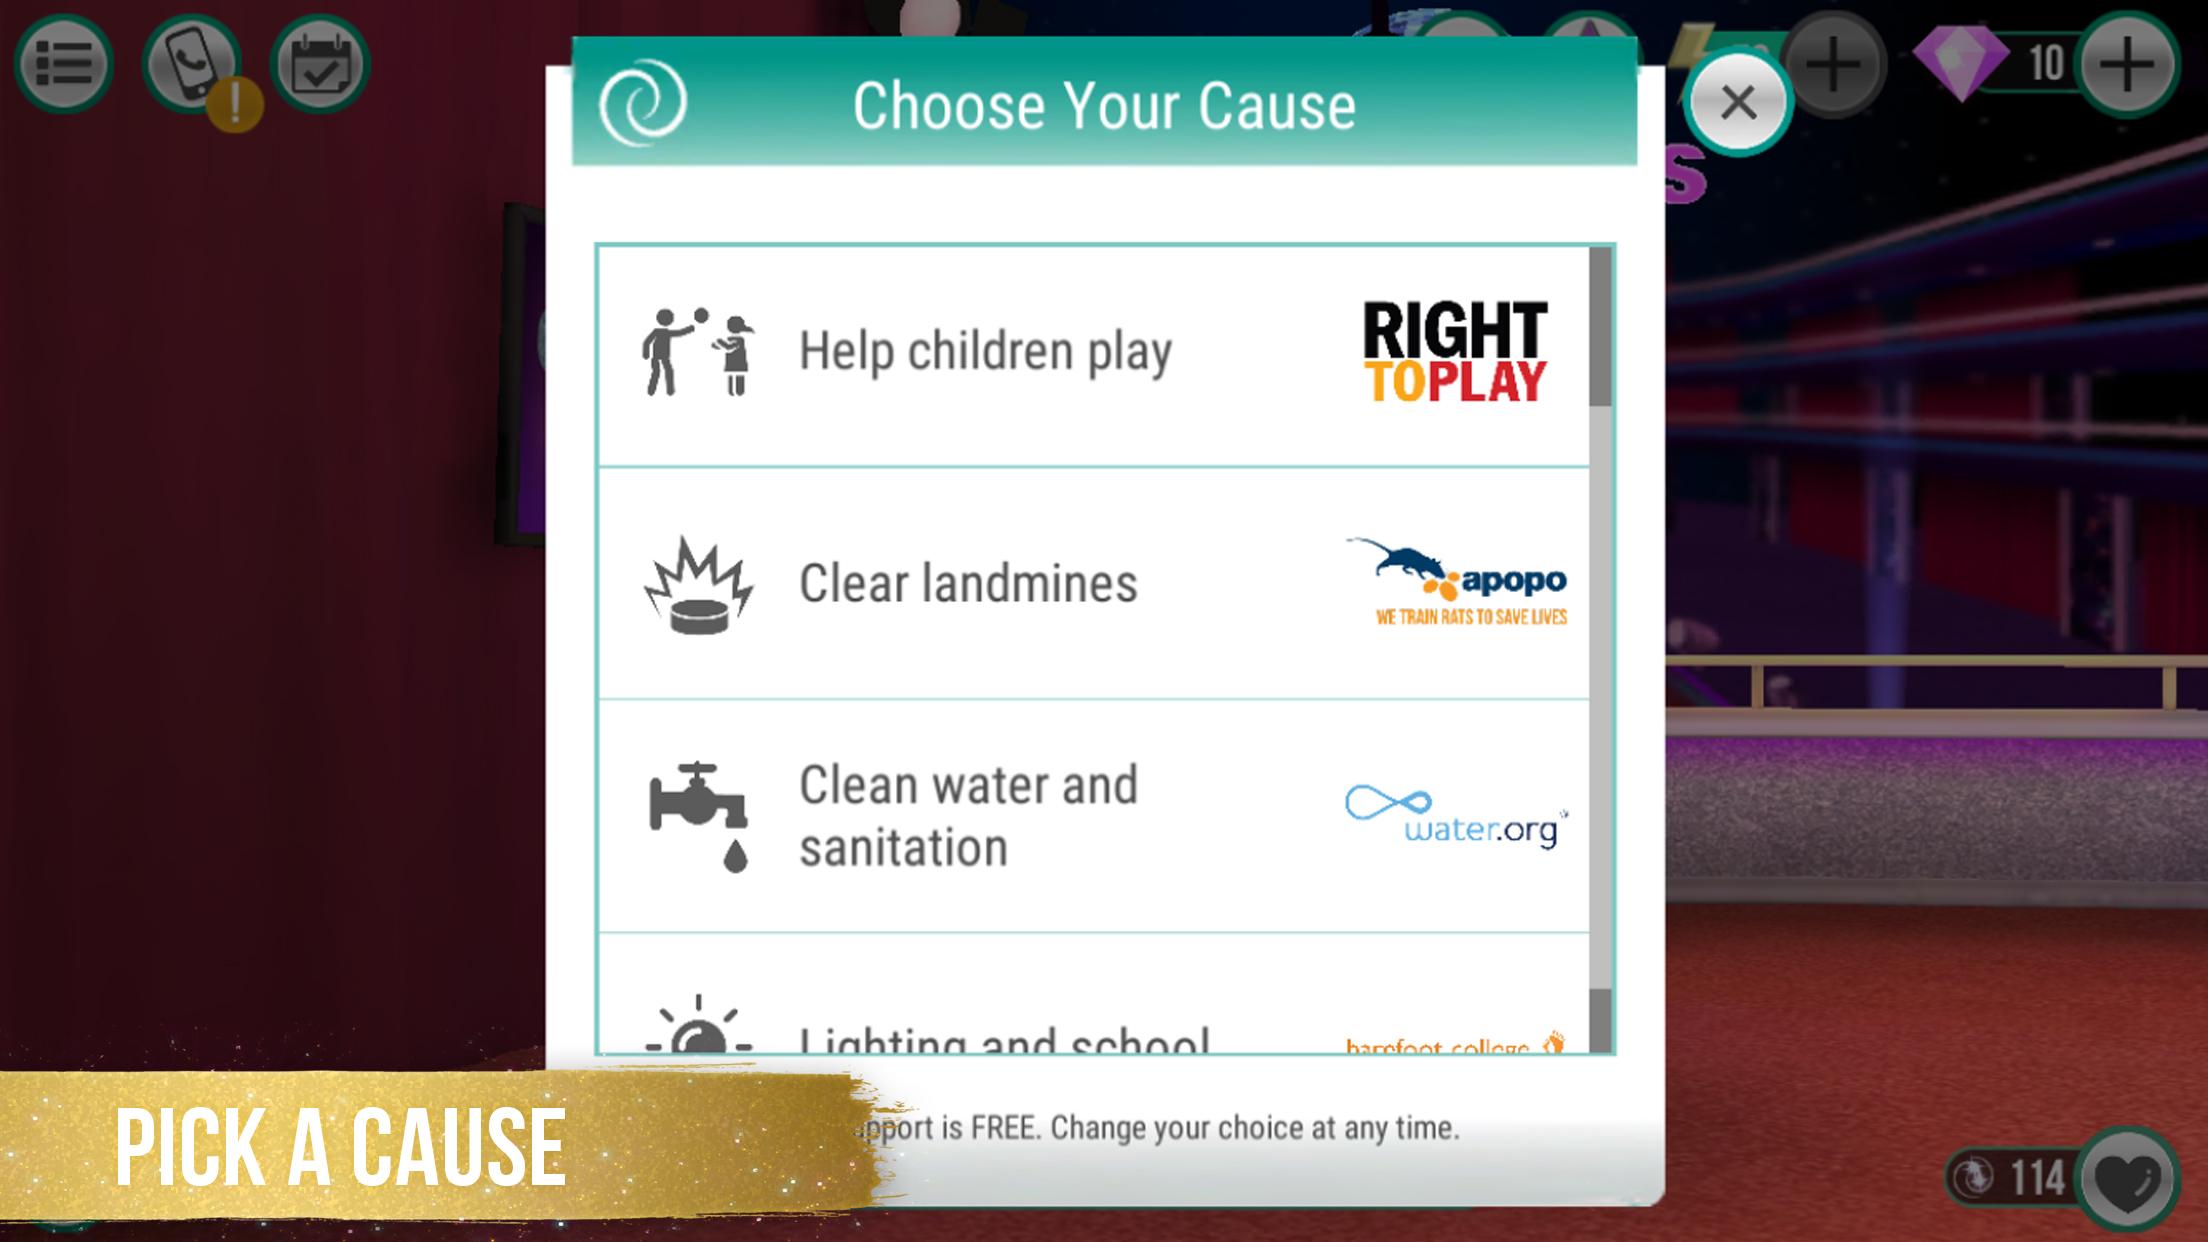 1_Pick a cause.jpg